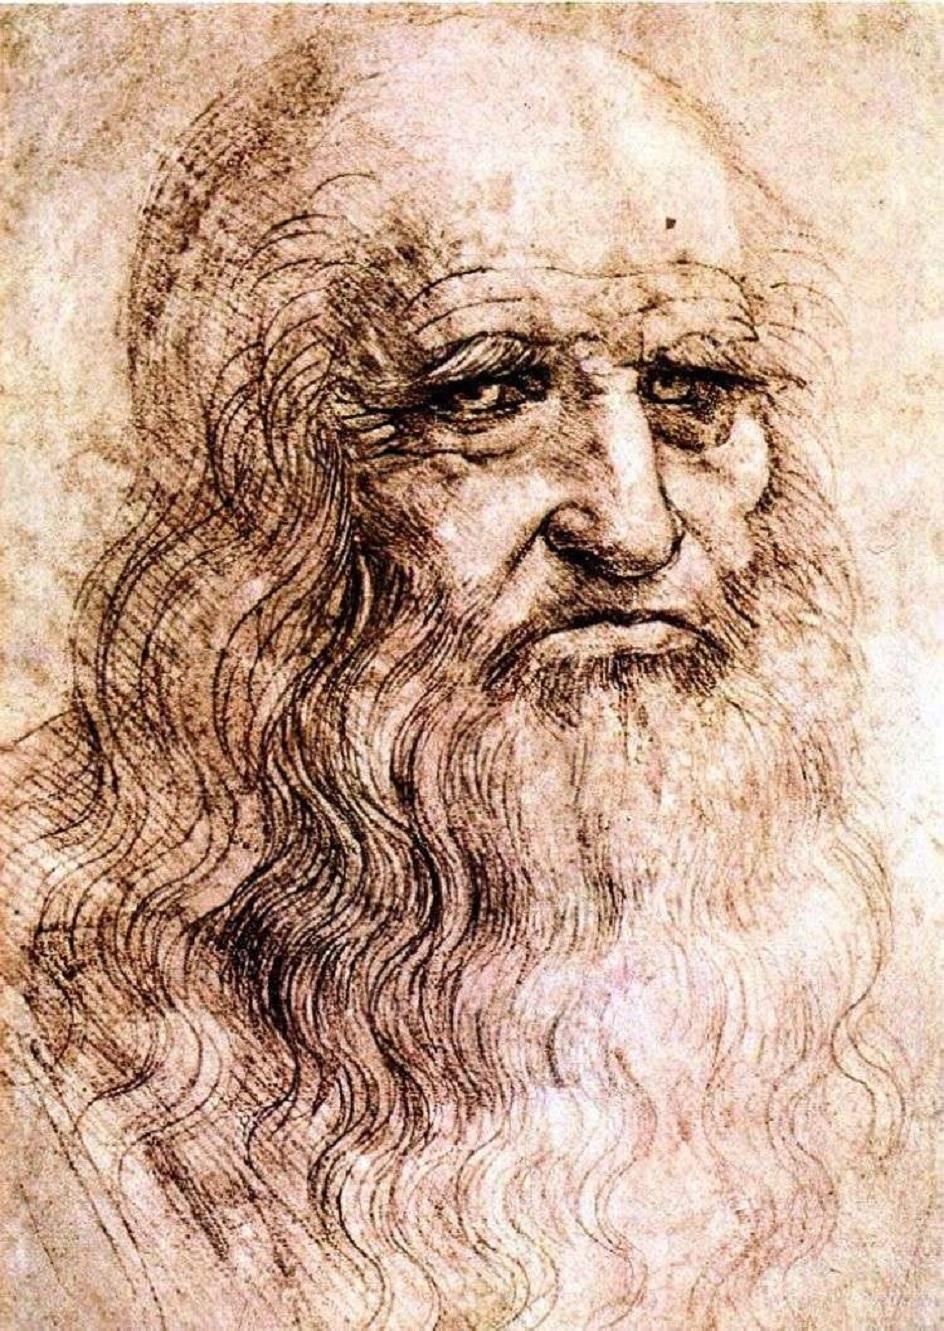 Сангина. Леонардо да Винчи.  Рисунок «Туринский автопортрет», XVI век